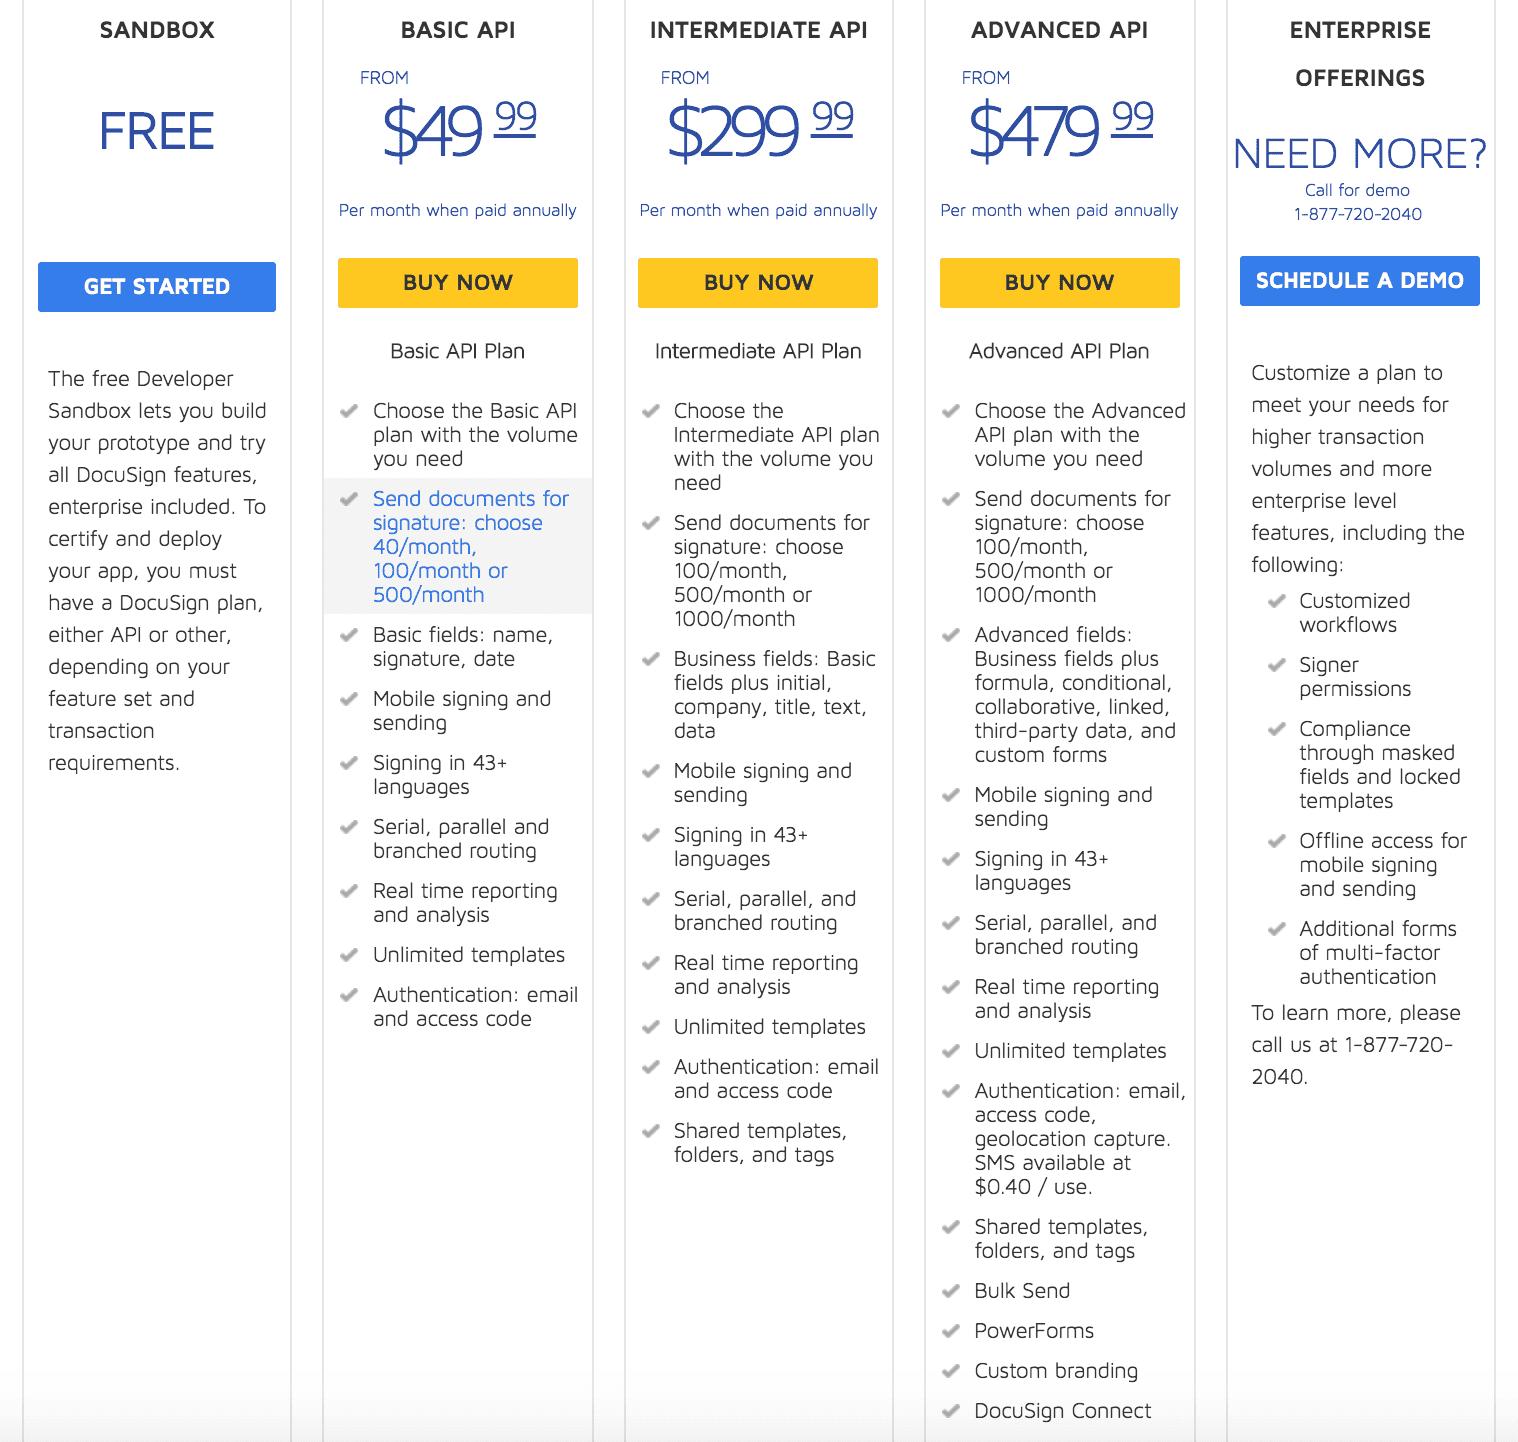 API Plan